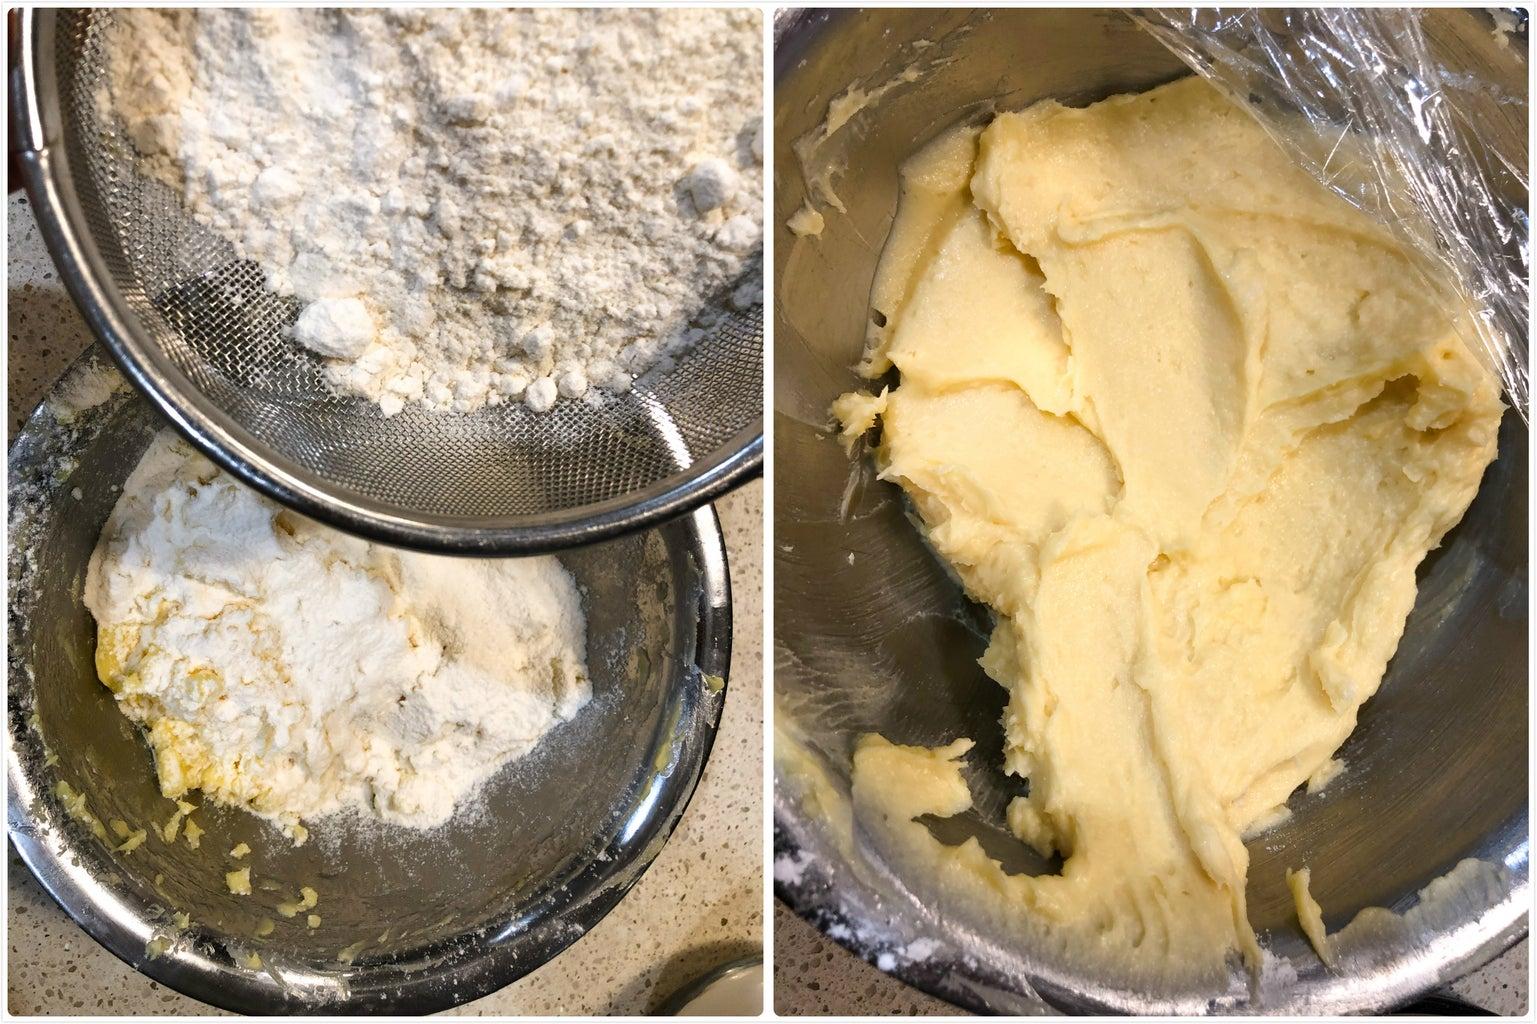 Make the Main Dough